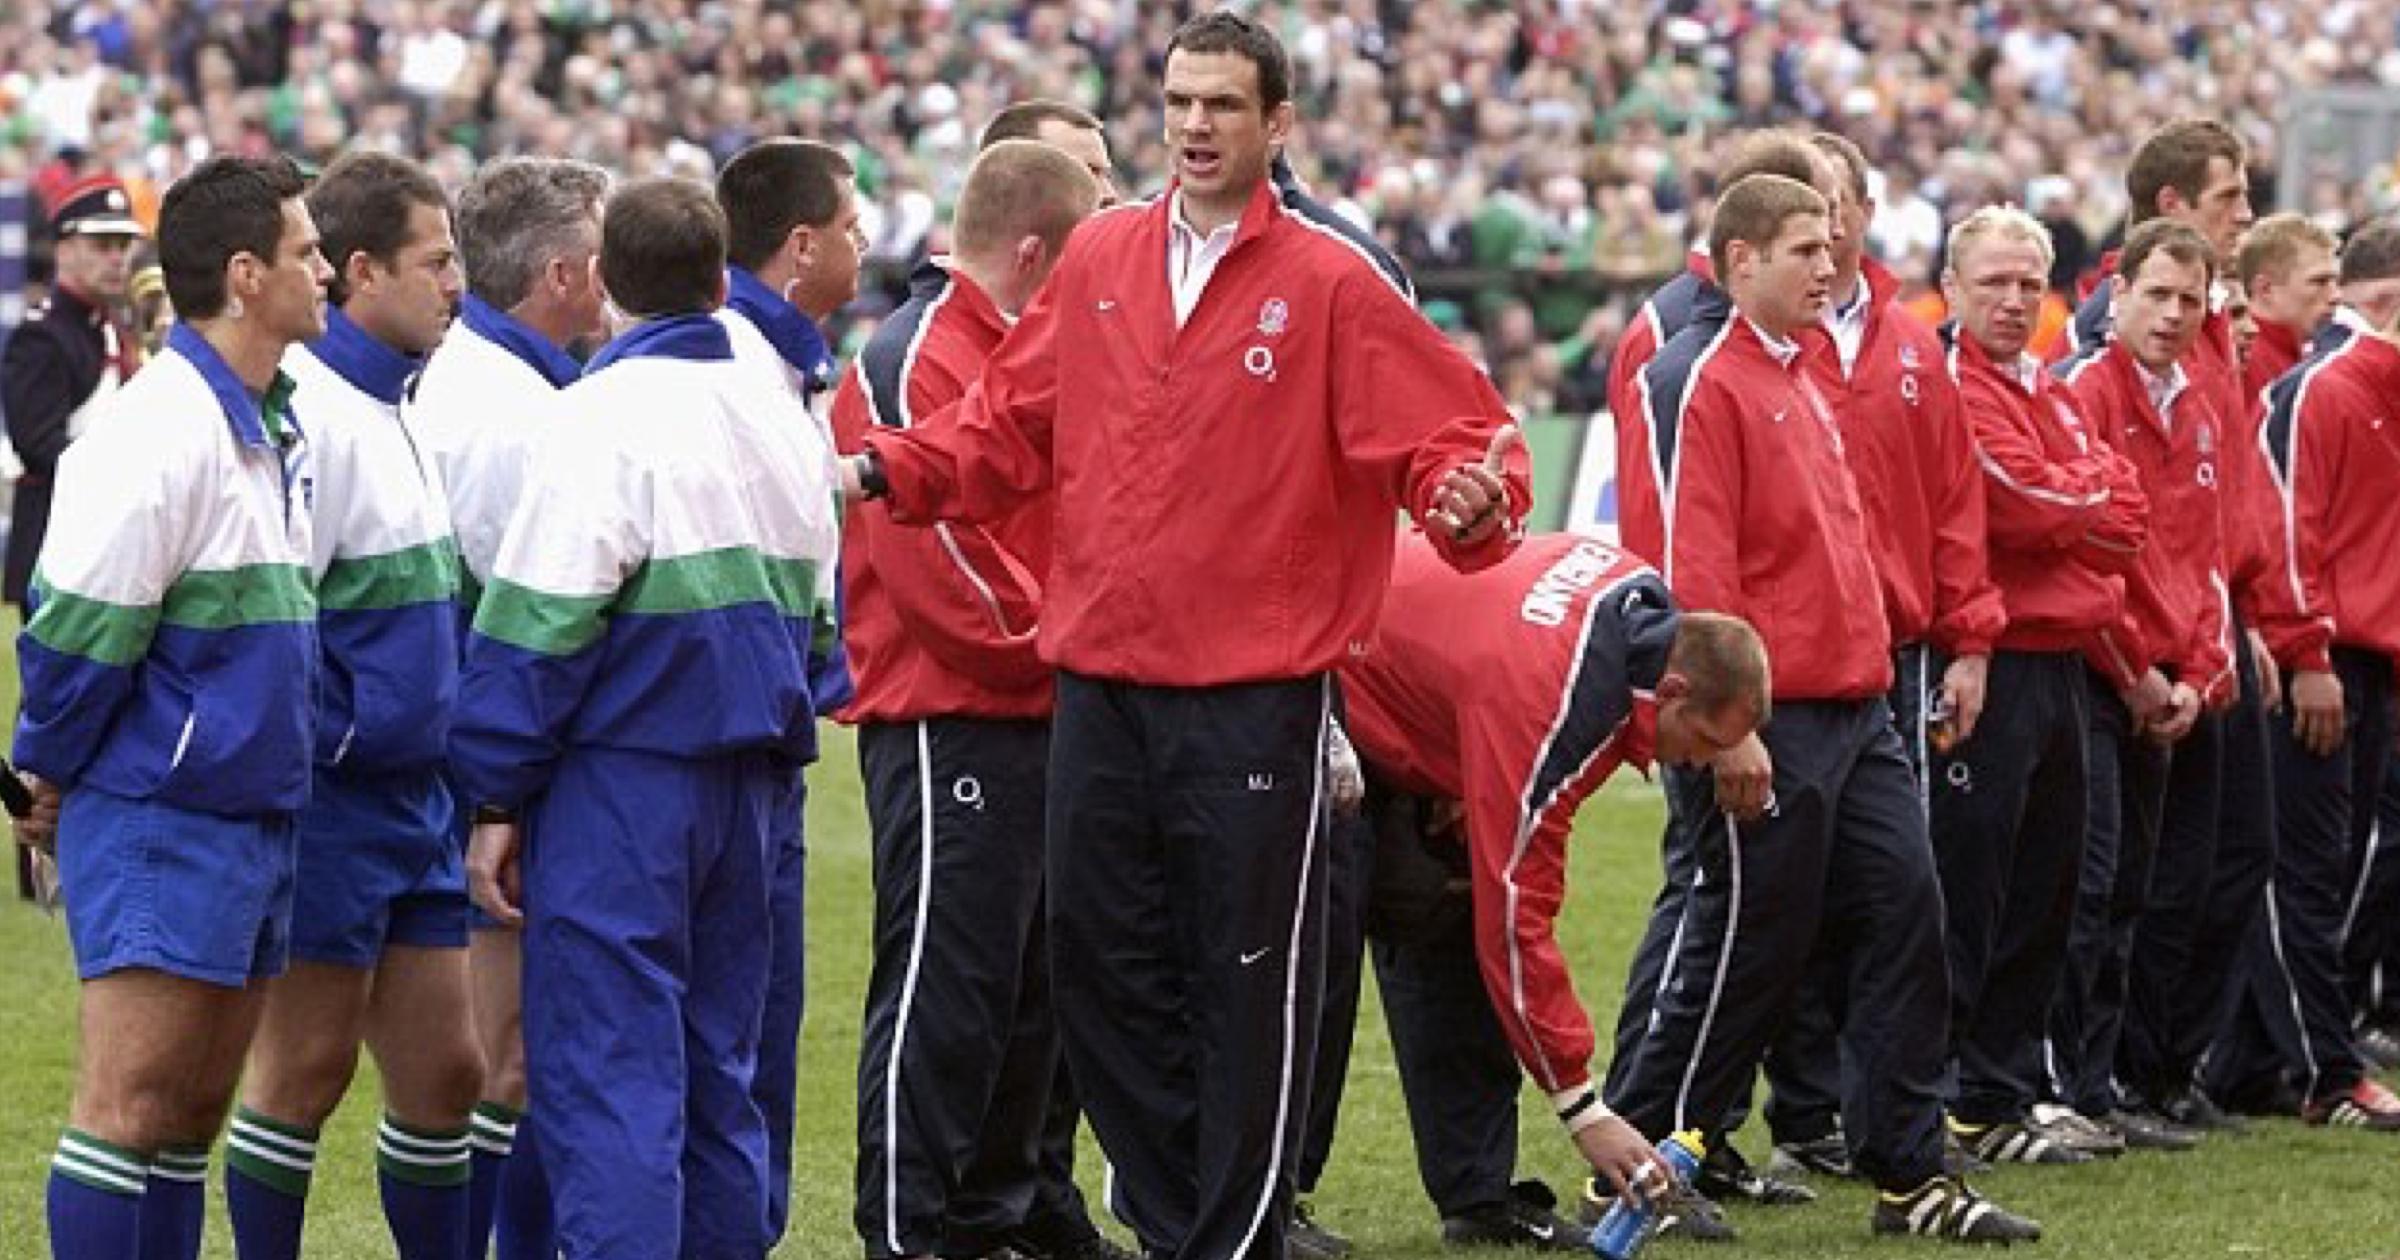 Throwback Ireland Vs England 2003 Mary Mcaleese Vs Martin Johnson Benchwarmers